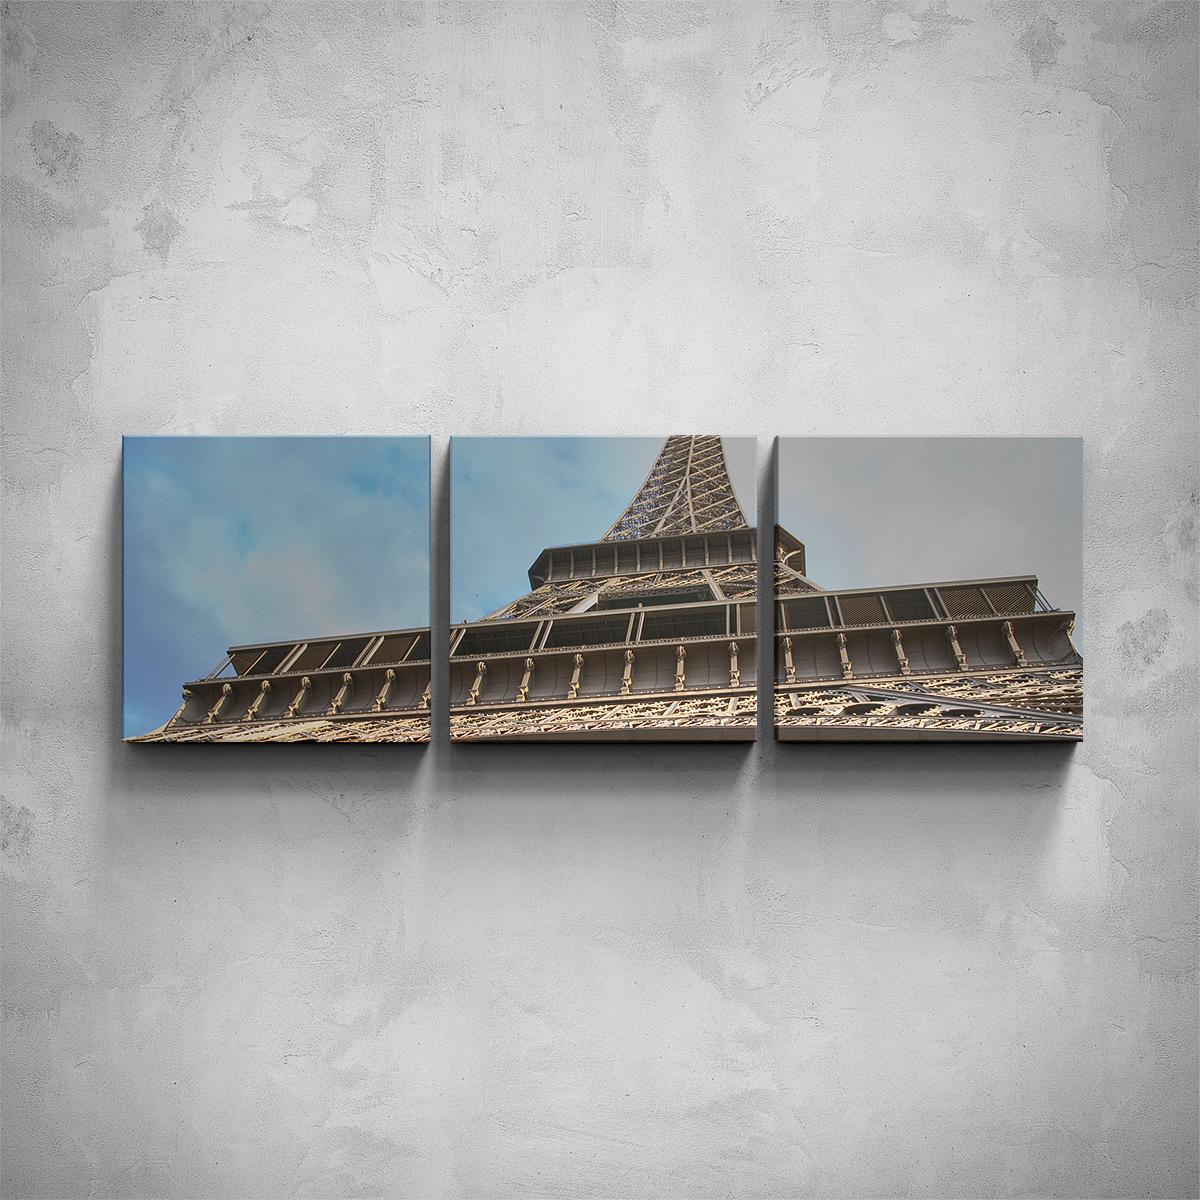 3-dílný obraz - Eiffelova věž detail - PopyDesign